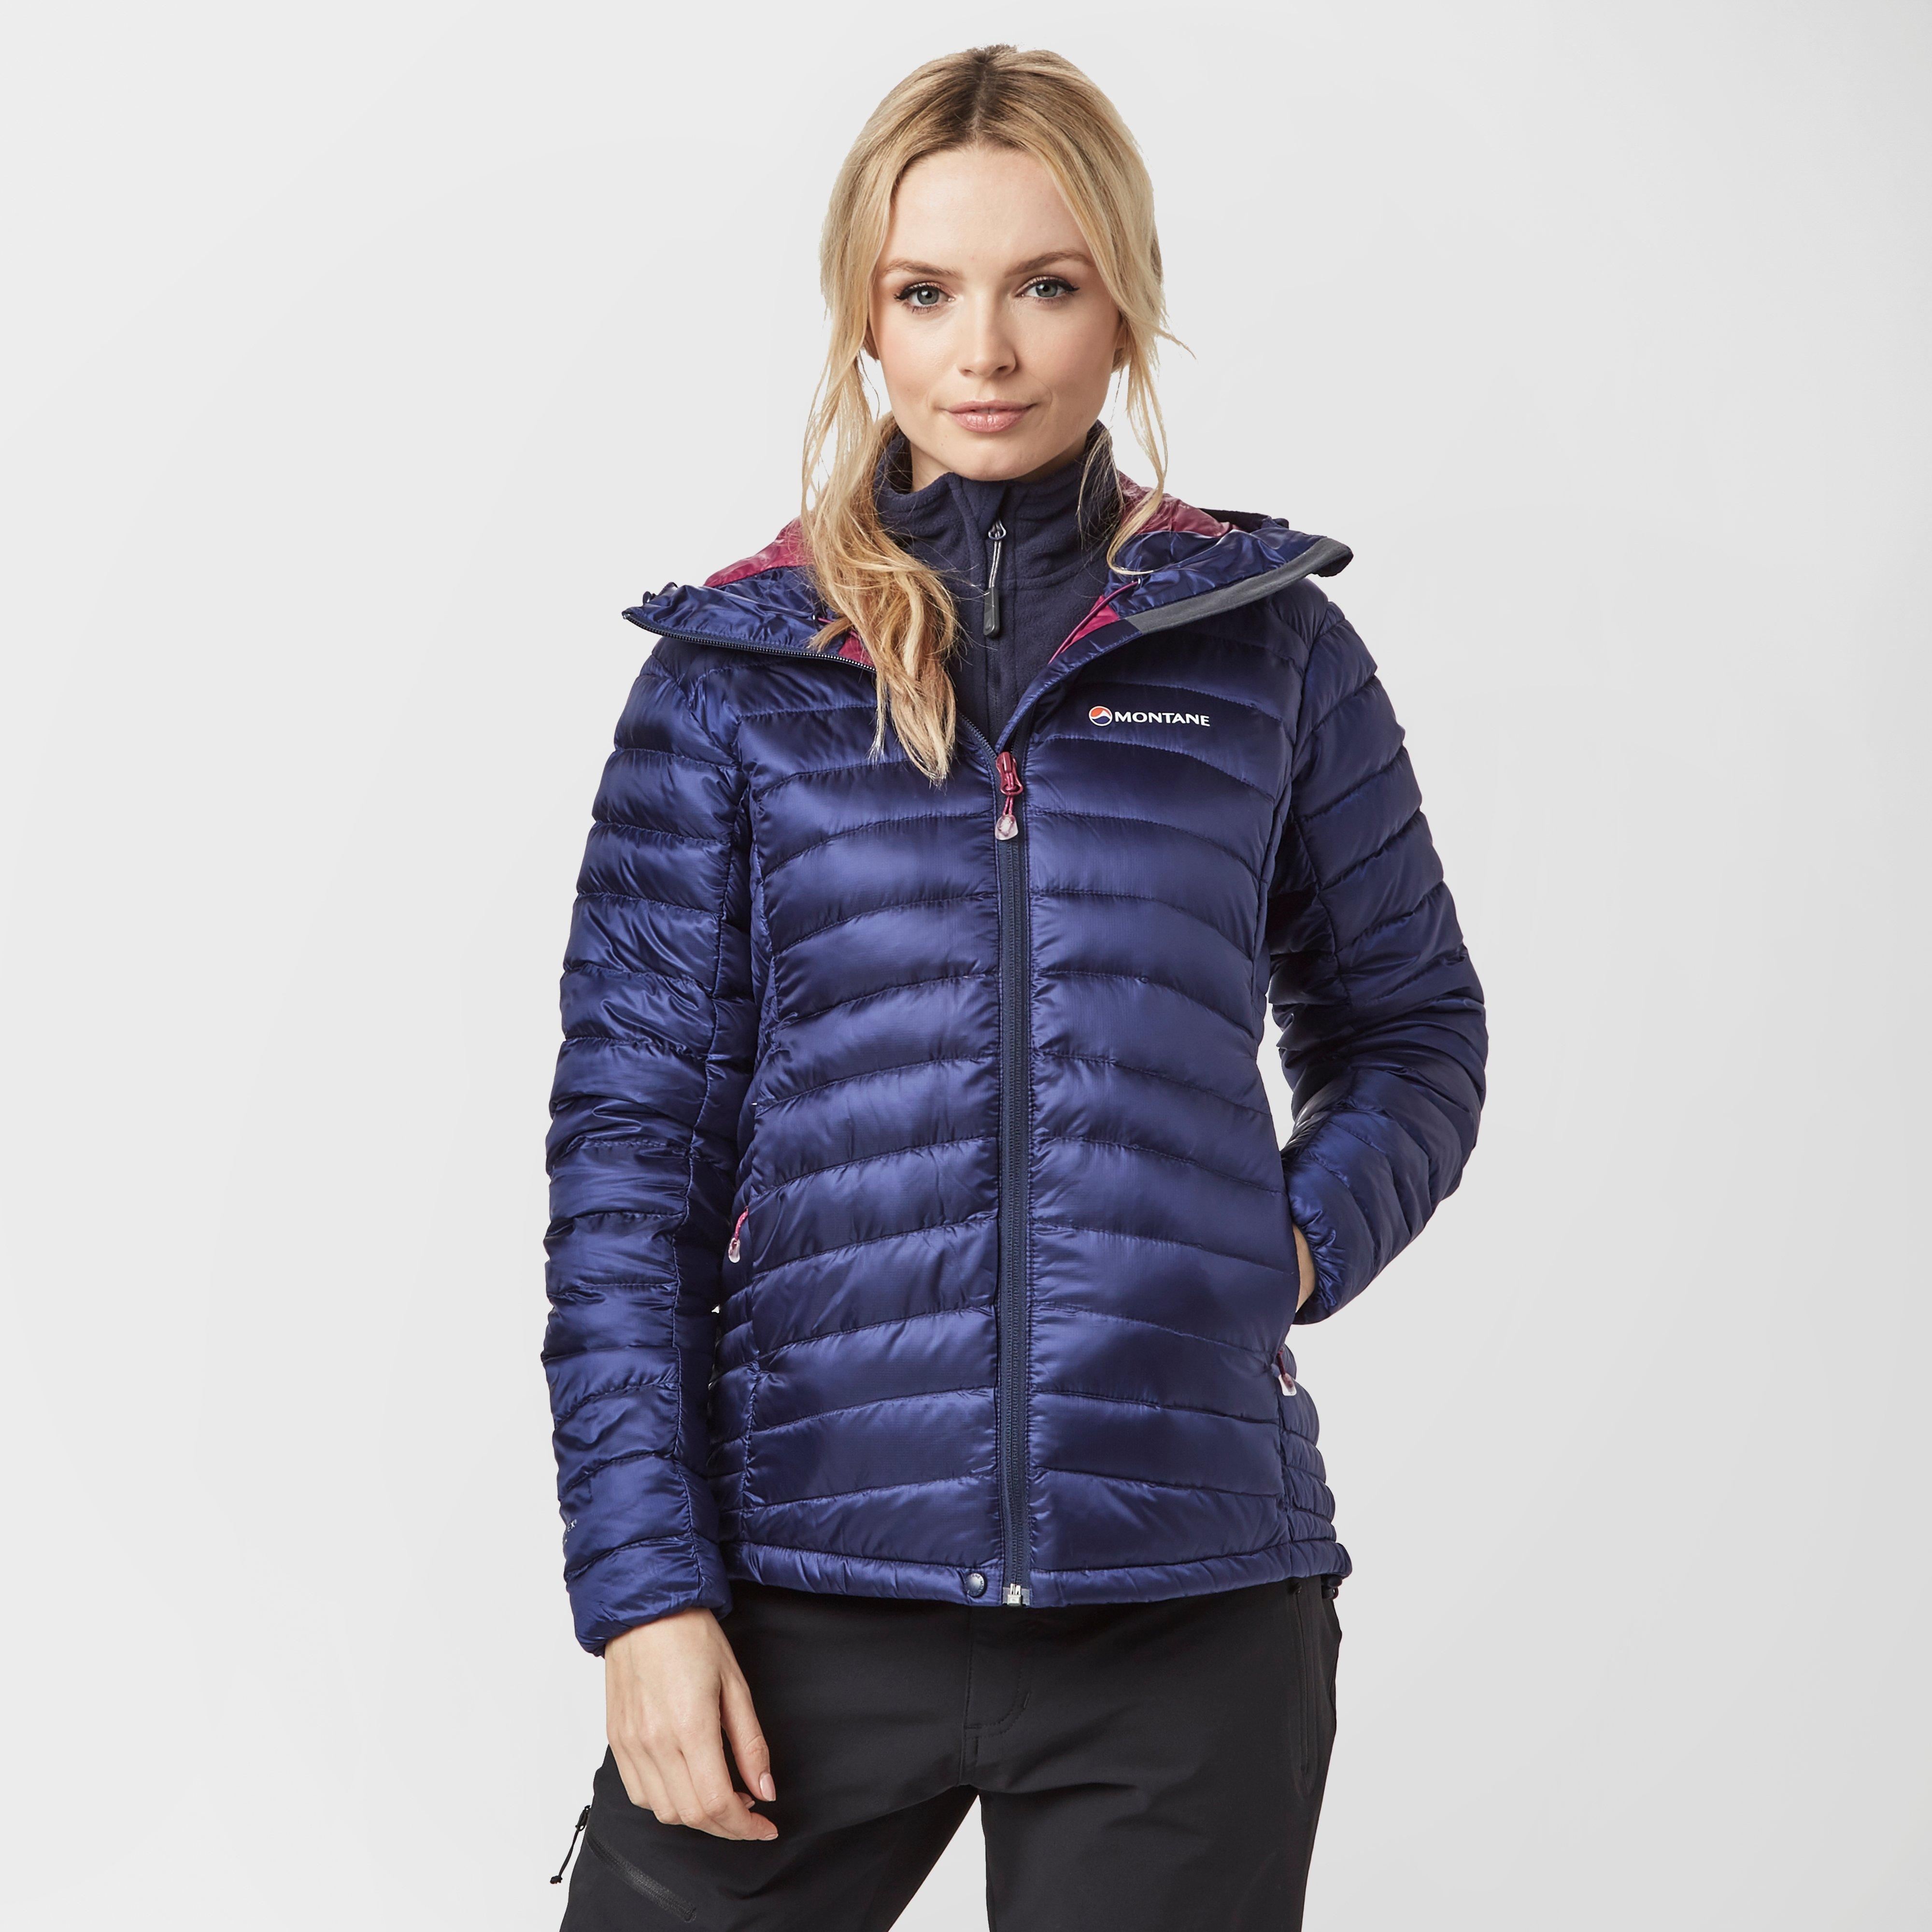 3bfef798309 Montane Featherlite Down Jacket – Women s